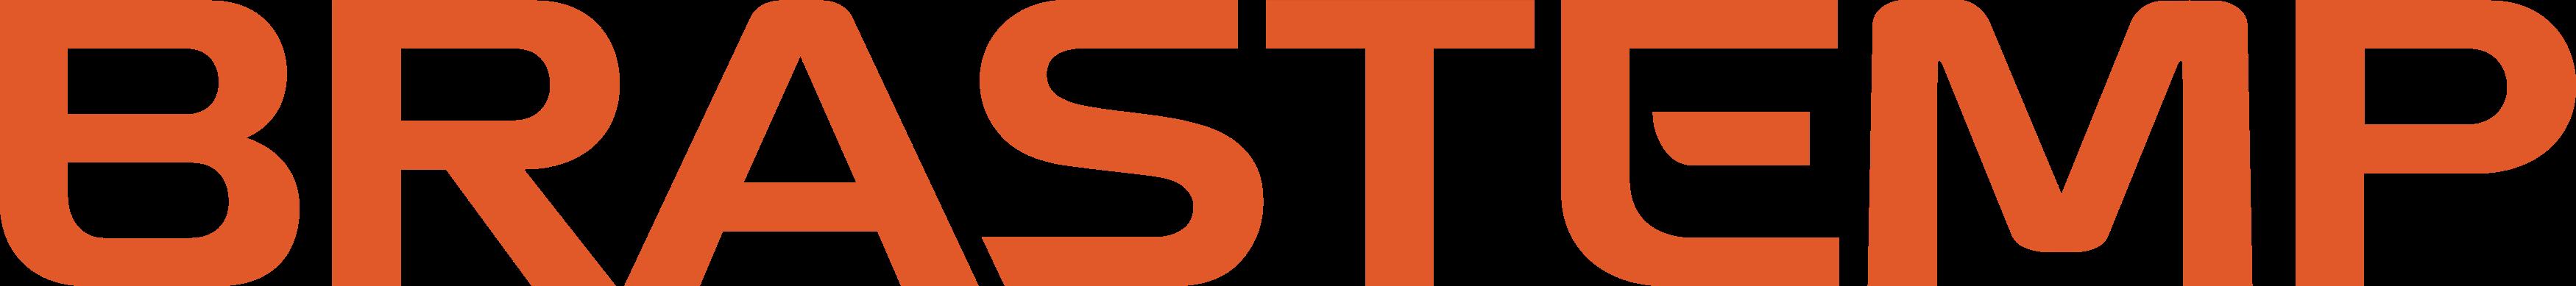 Logo da marca brastemp